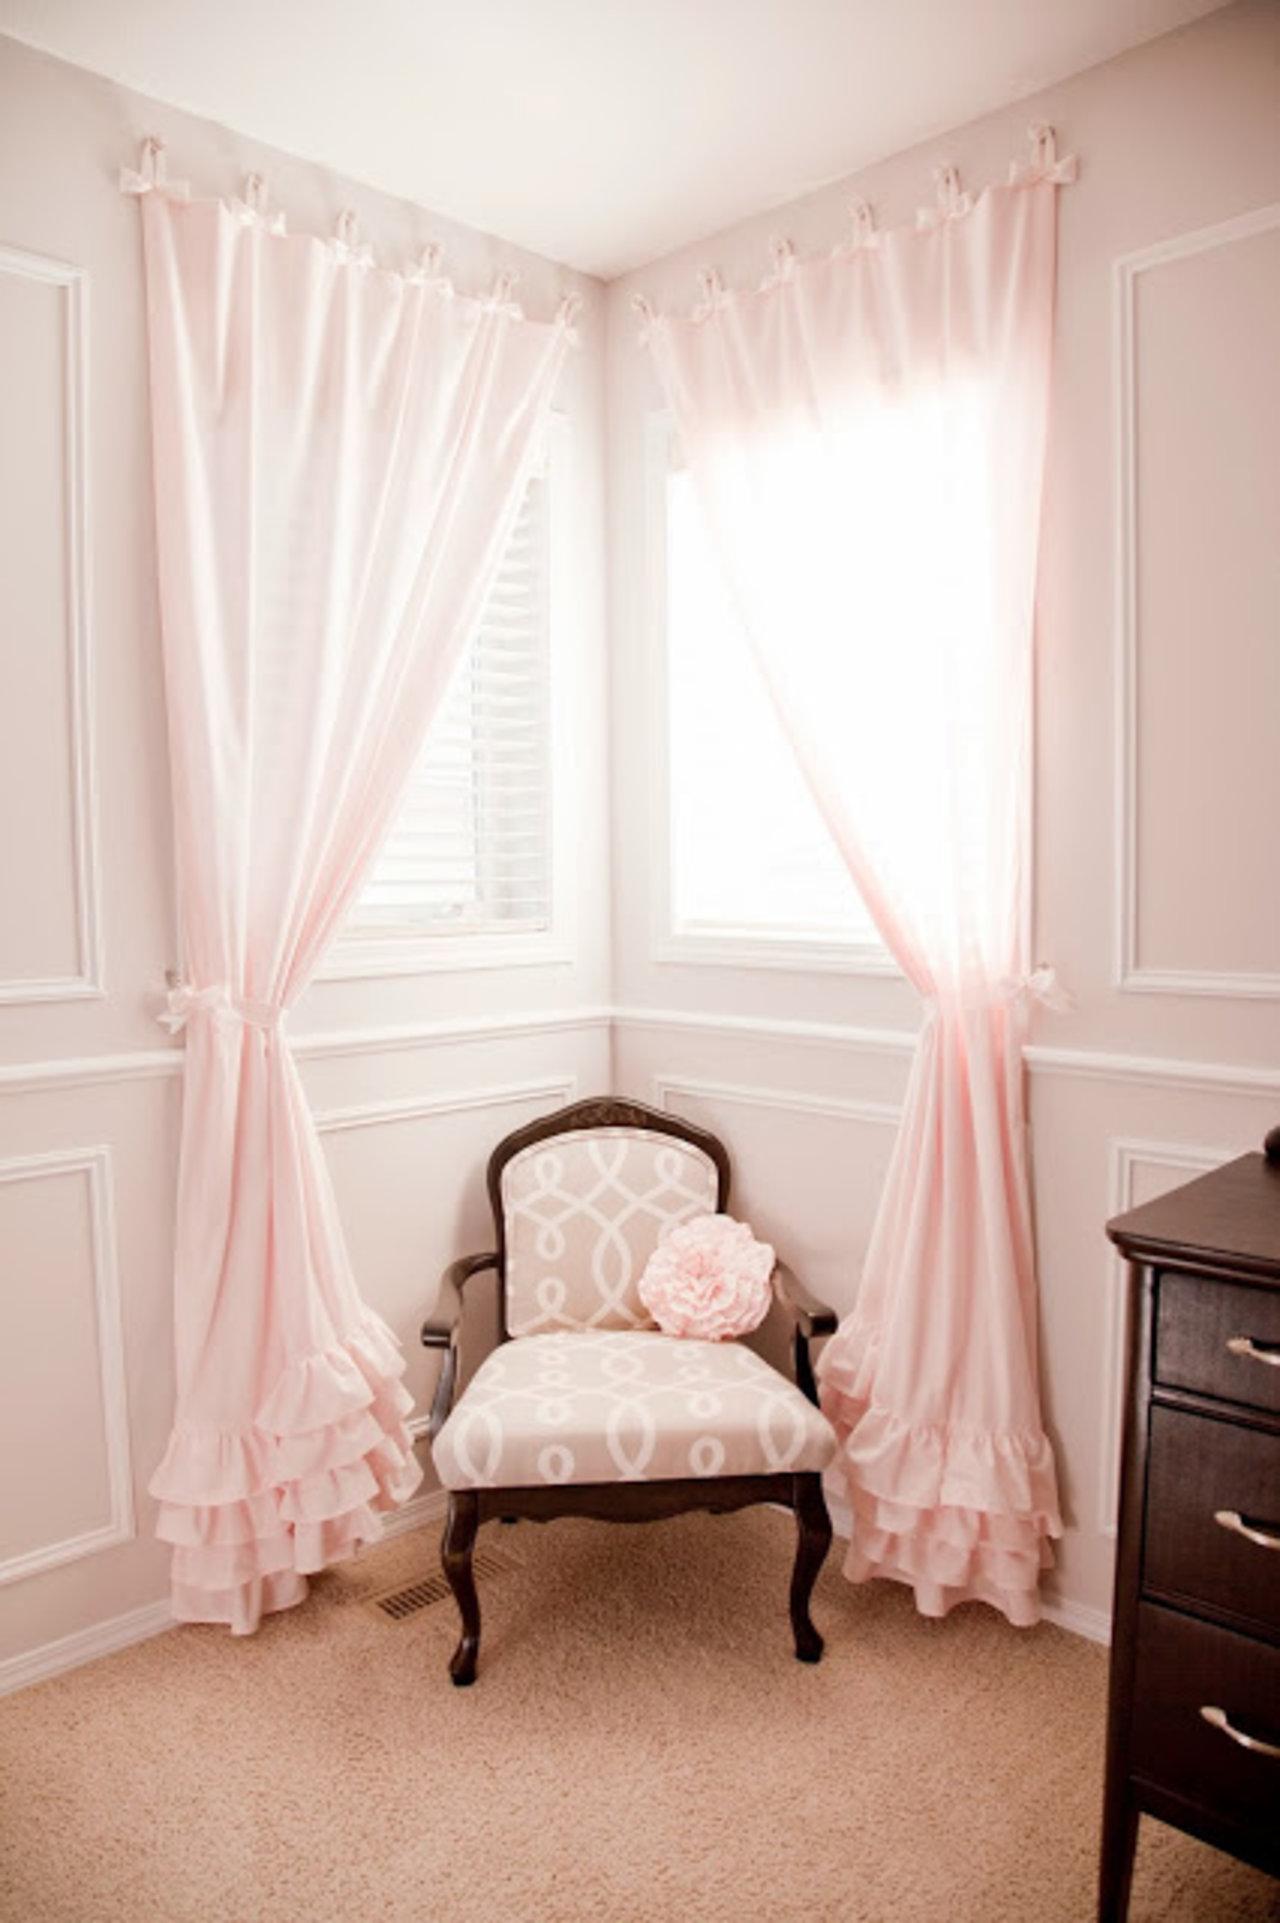 Corner Window Curtains: Styles of Decorating Ideas – HomesFeed